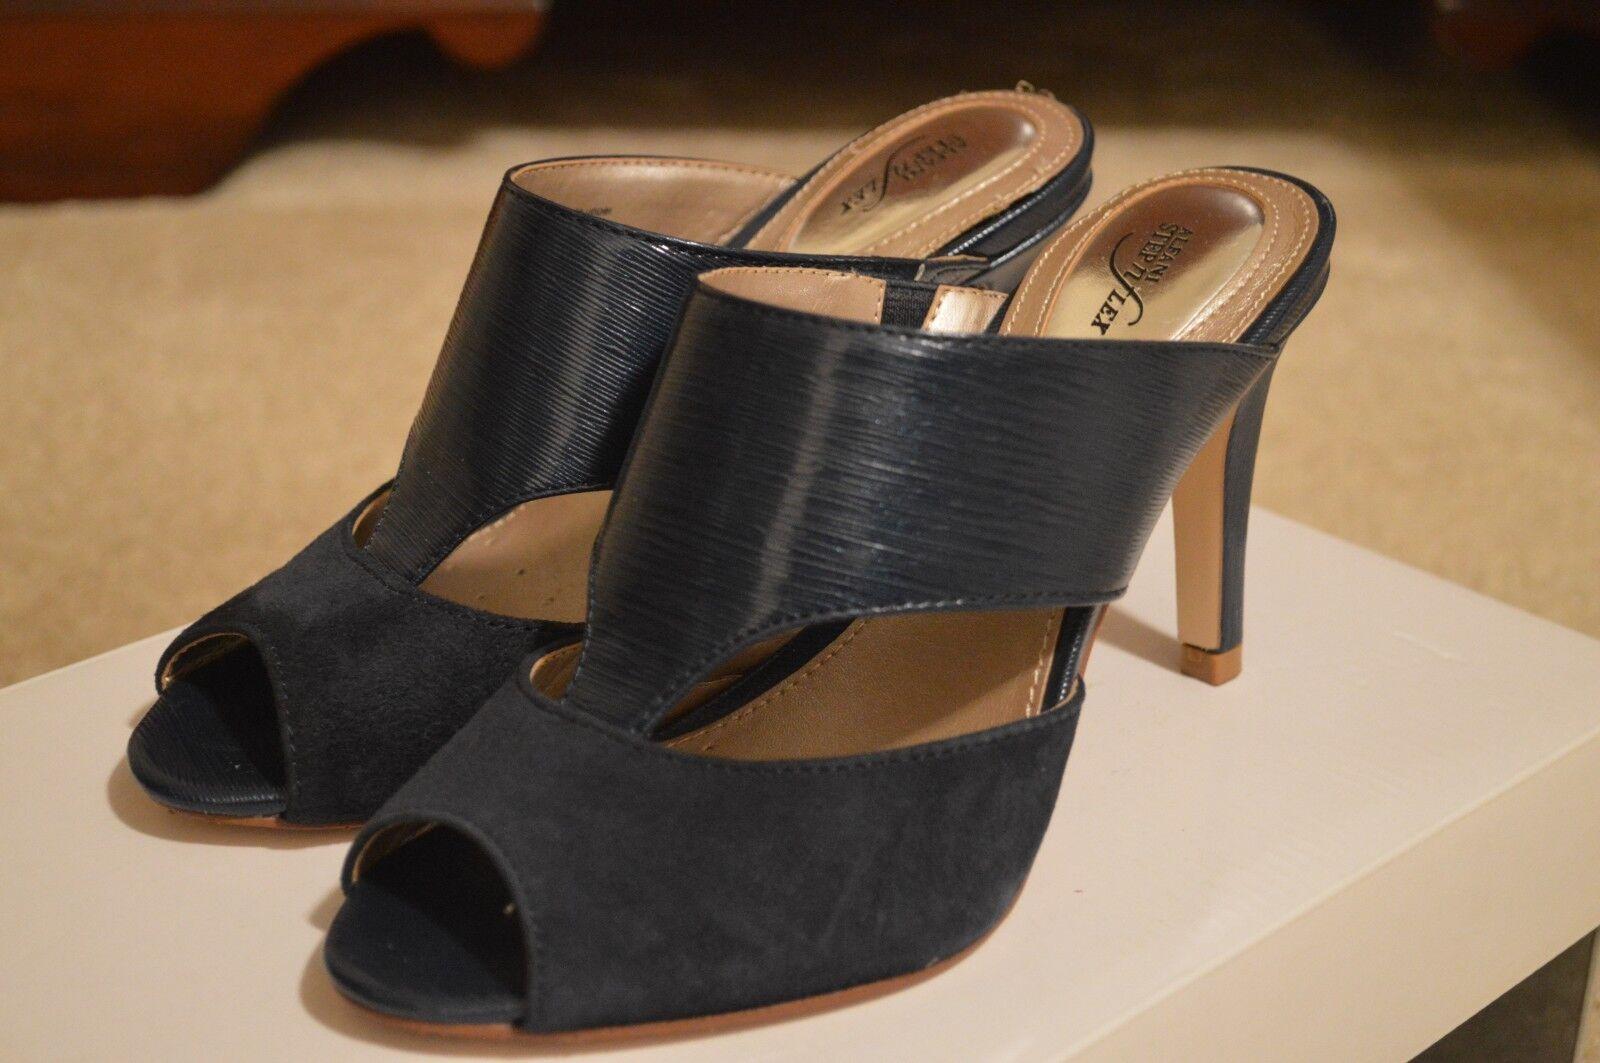 Alfani Step n Flex Women's Morgin Dress Slide Sandals blueeberry Size 6.5 M